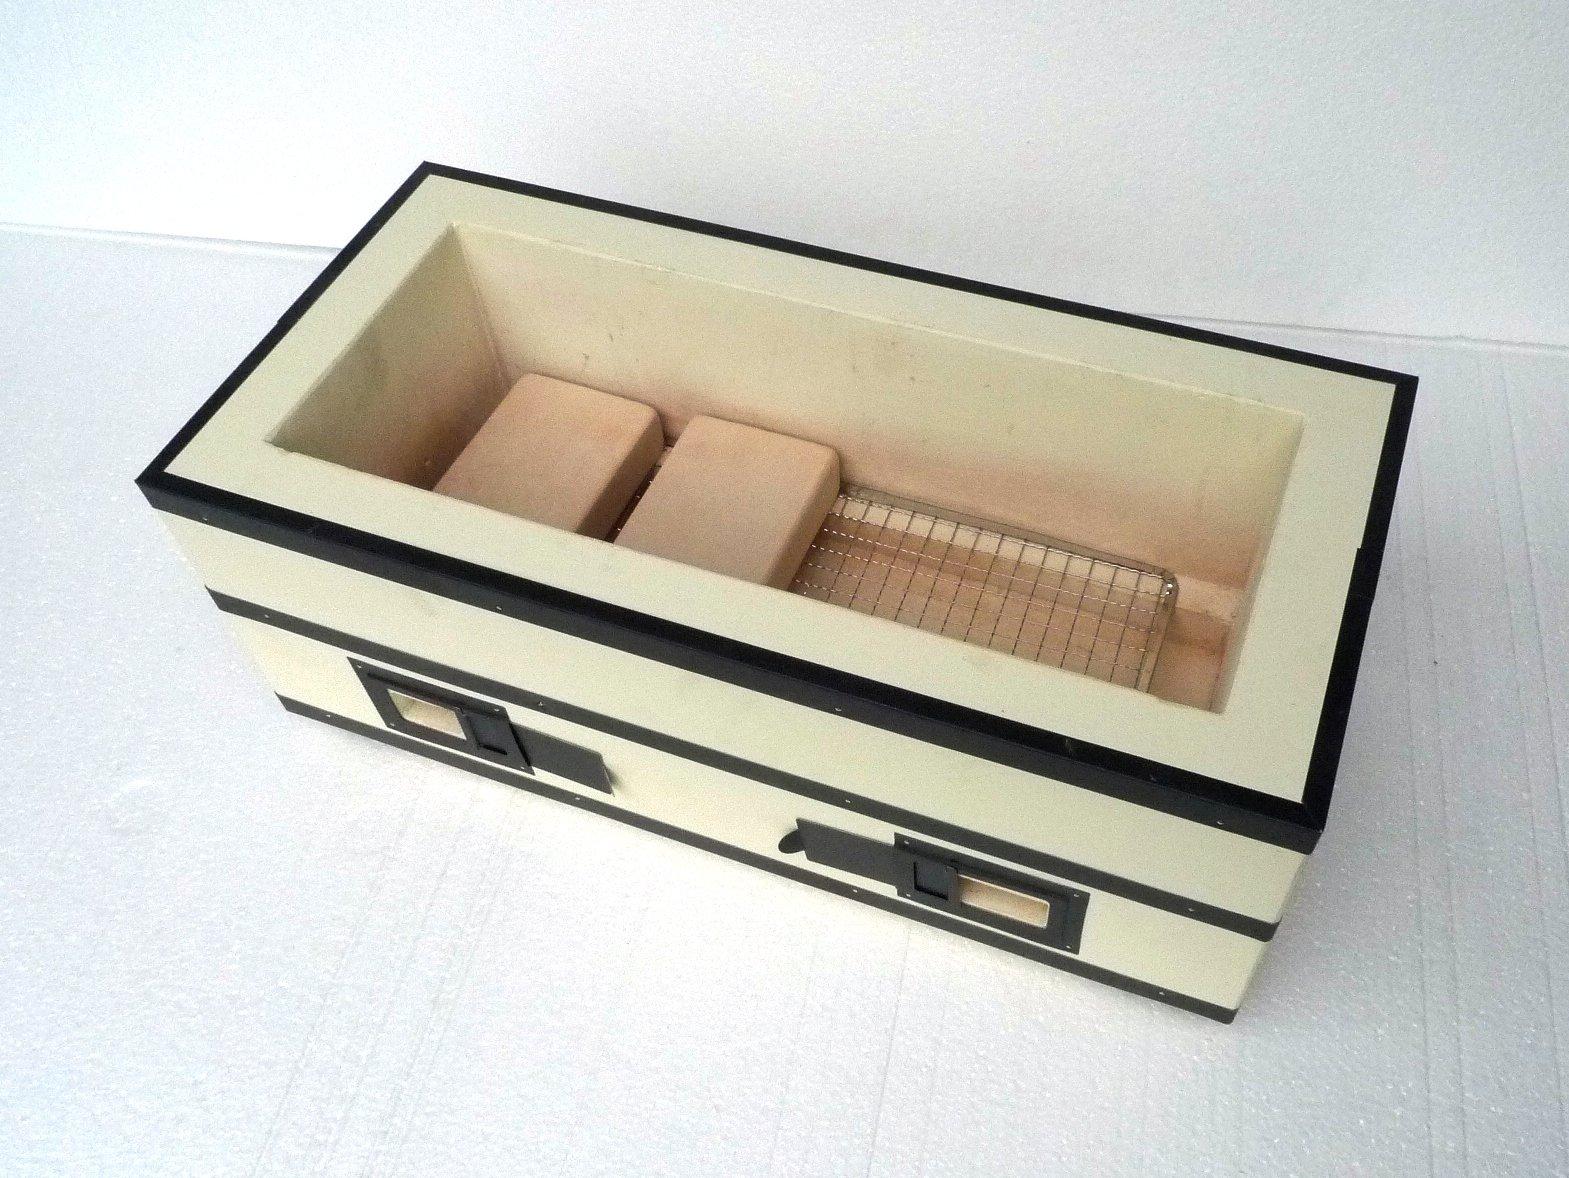 binchotan Japanese excellent charcoal konro grill/Hand made/Noto Ishikawa made by binchotan (Image #5)